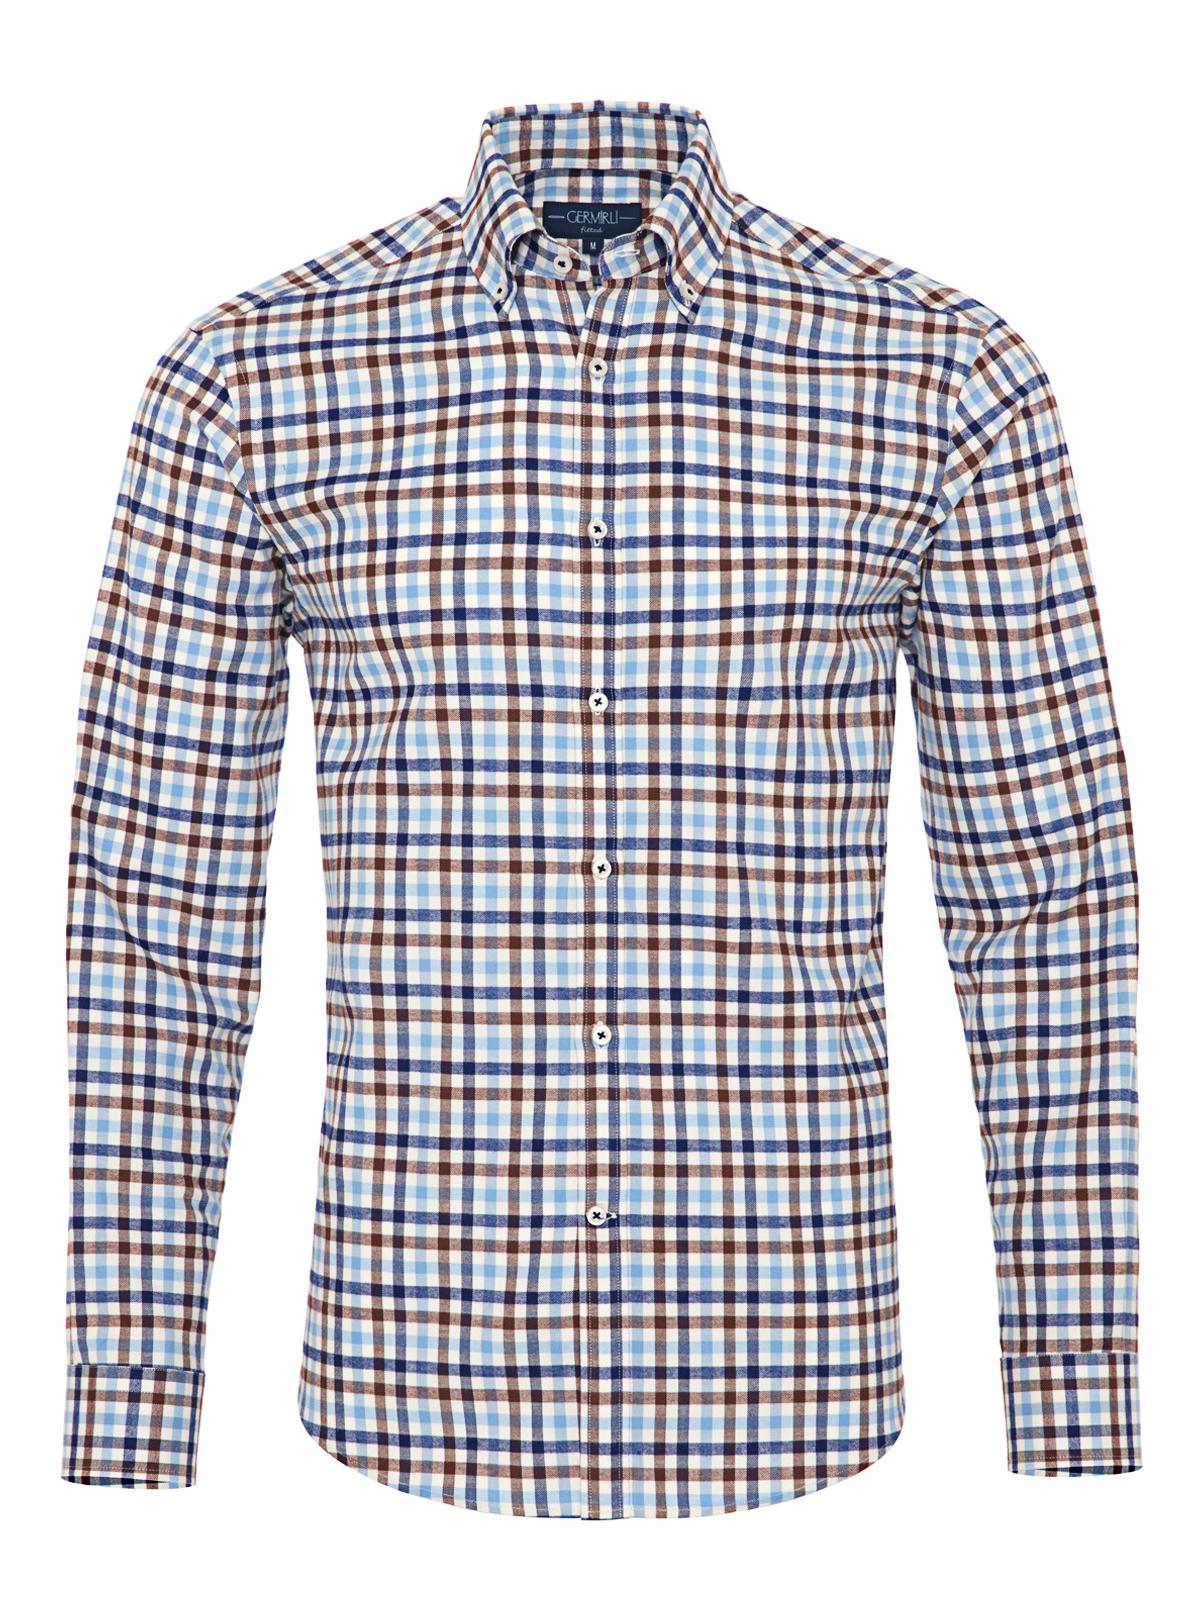 Germirli Blue White Brown Plaid Button Down Collar Flanel Tailor Fit Shirt